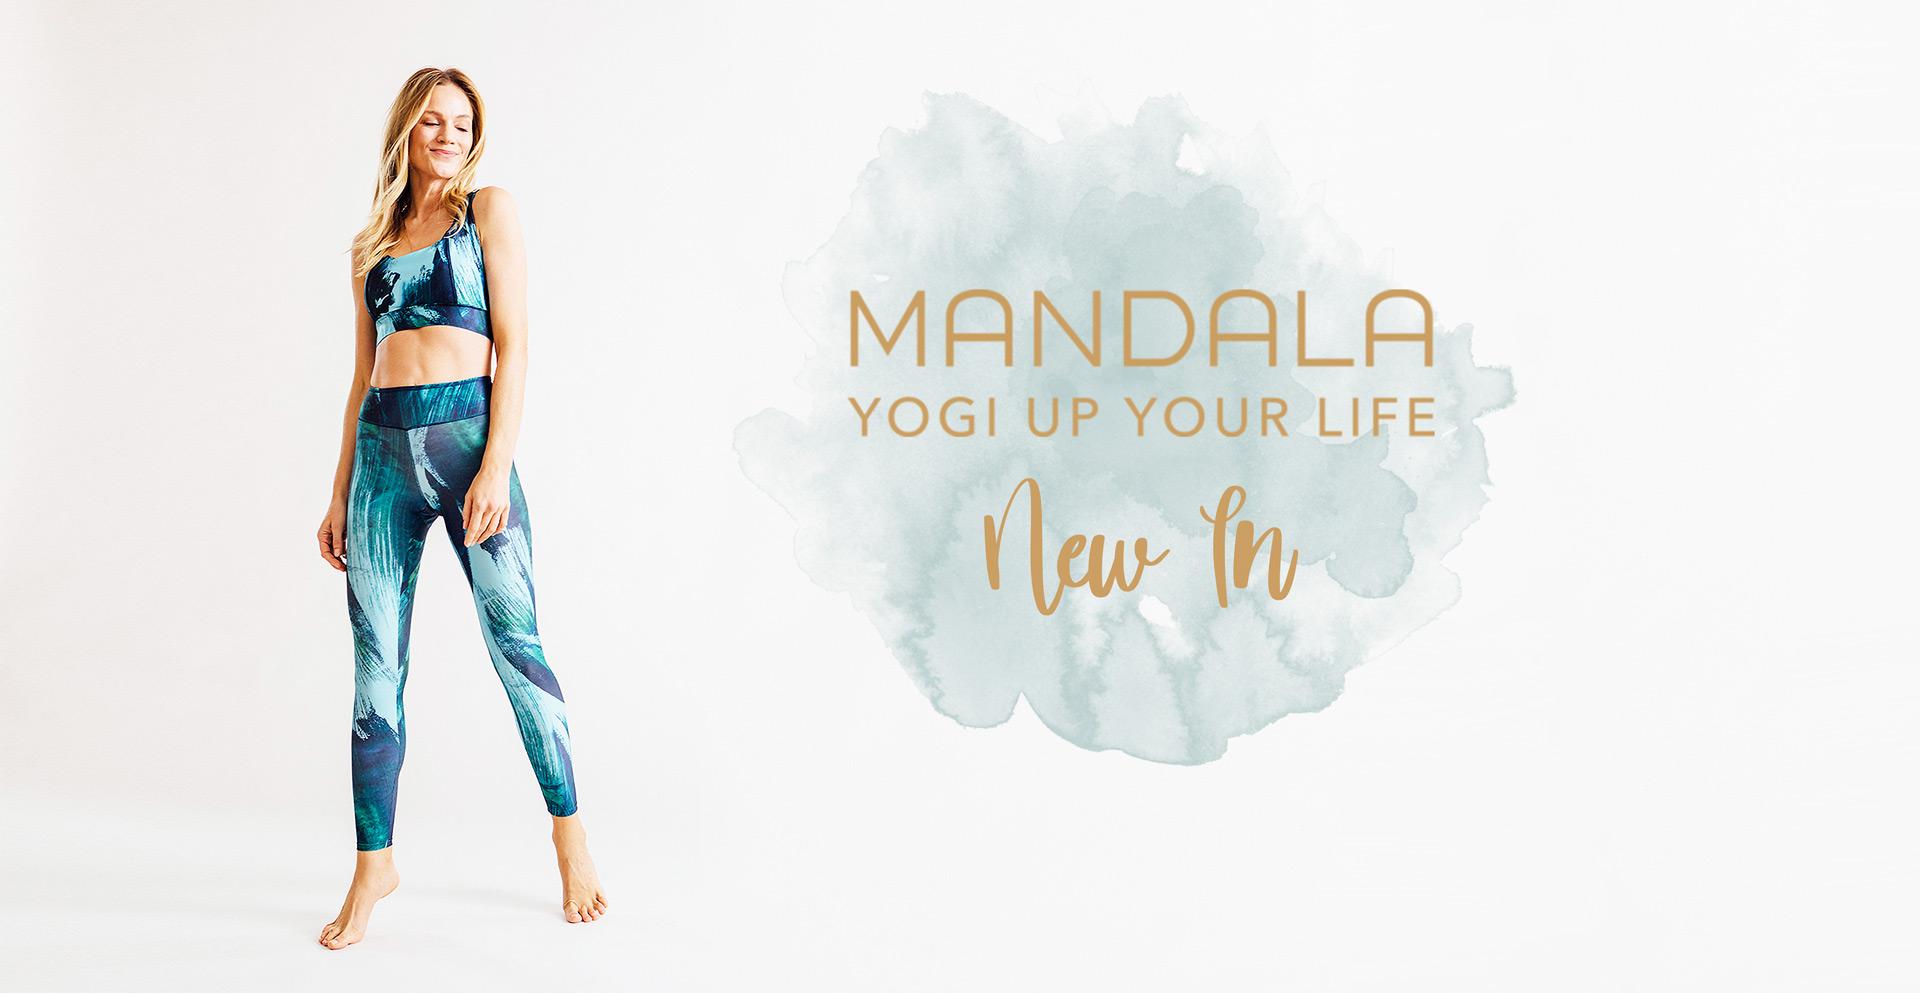 Mandala Fashion Fall Winter New In 2020